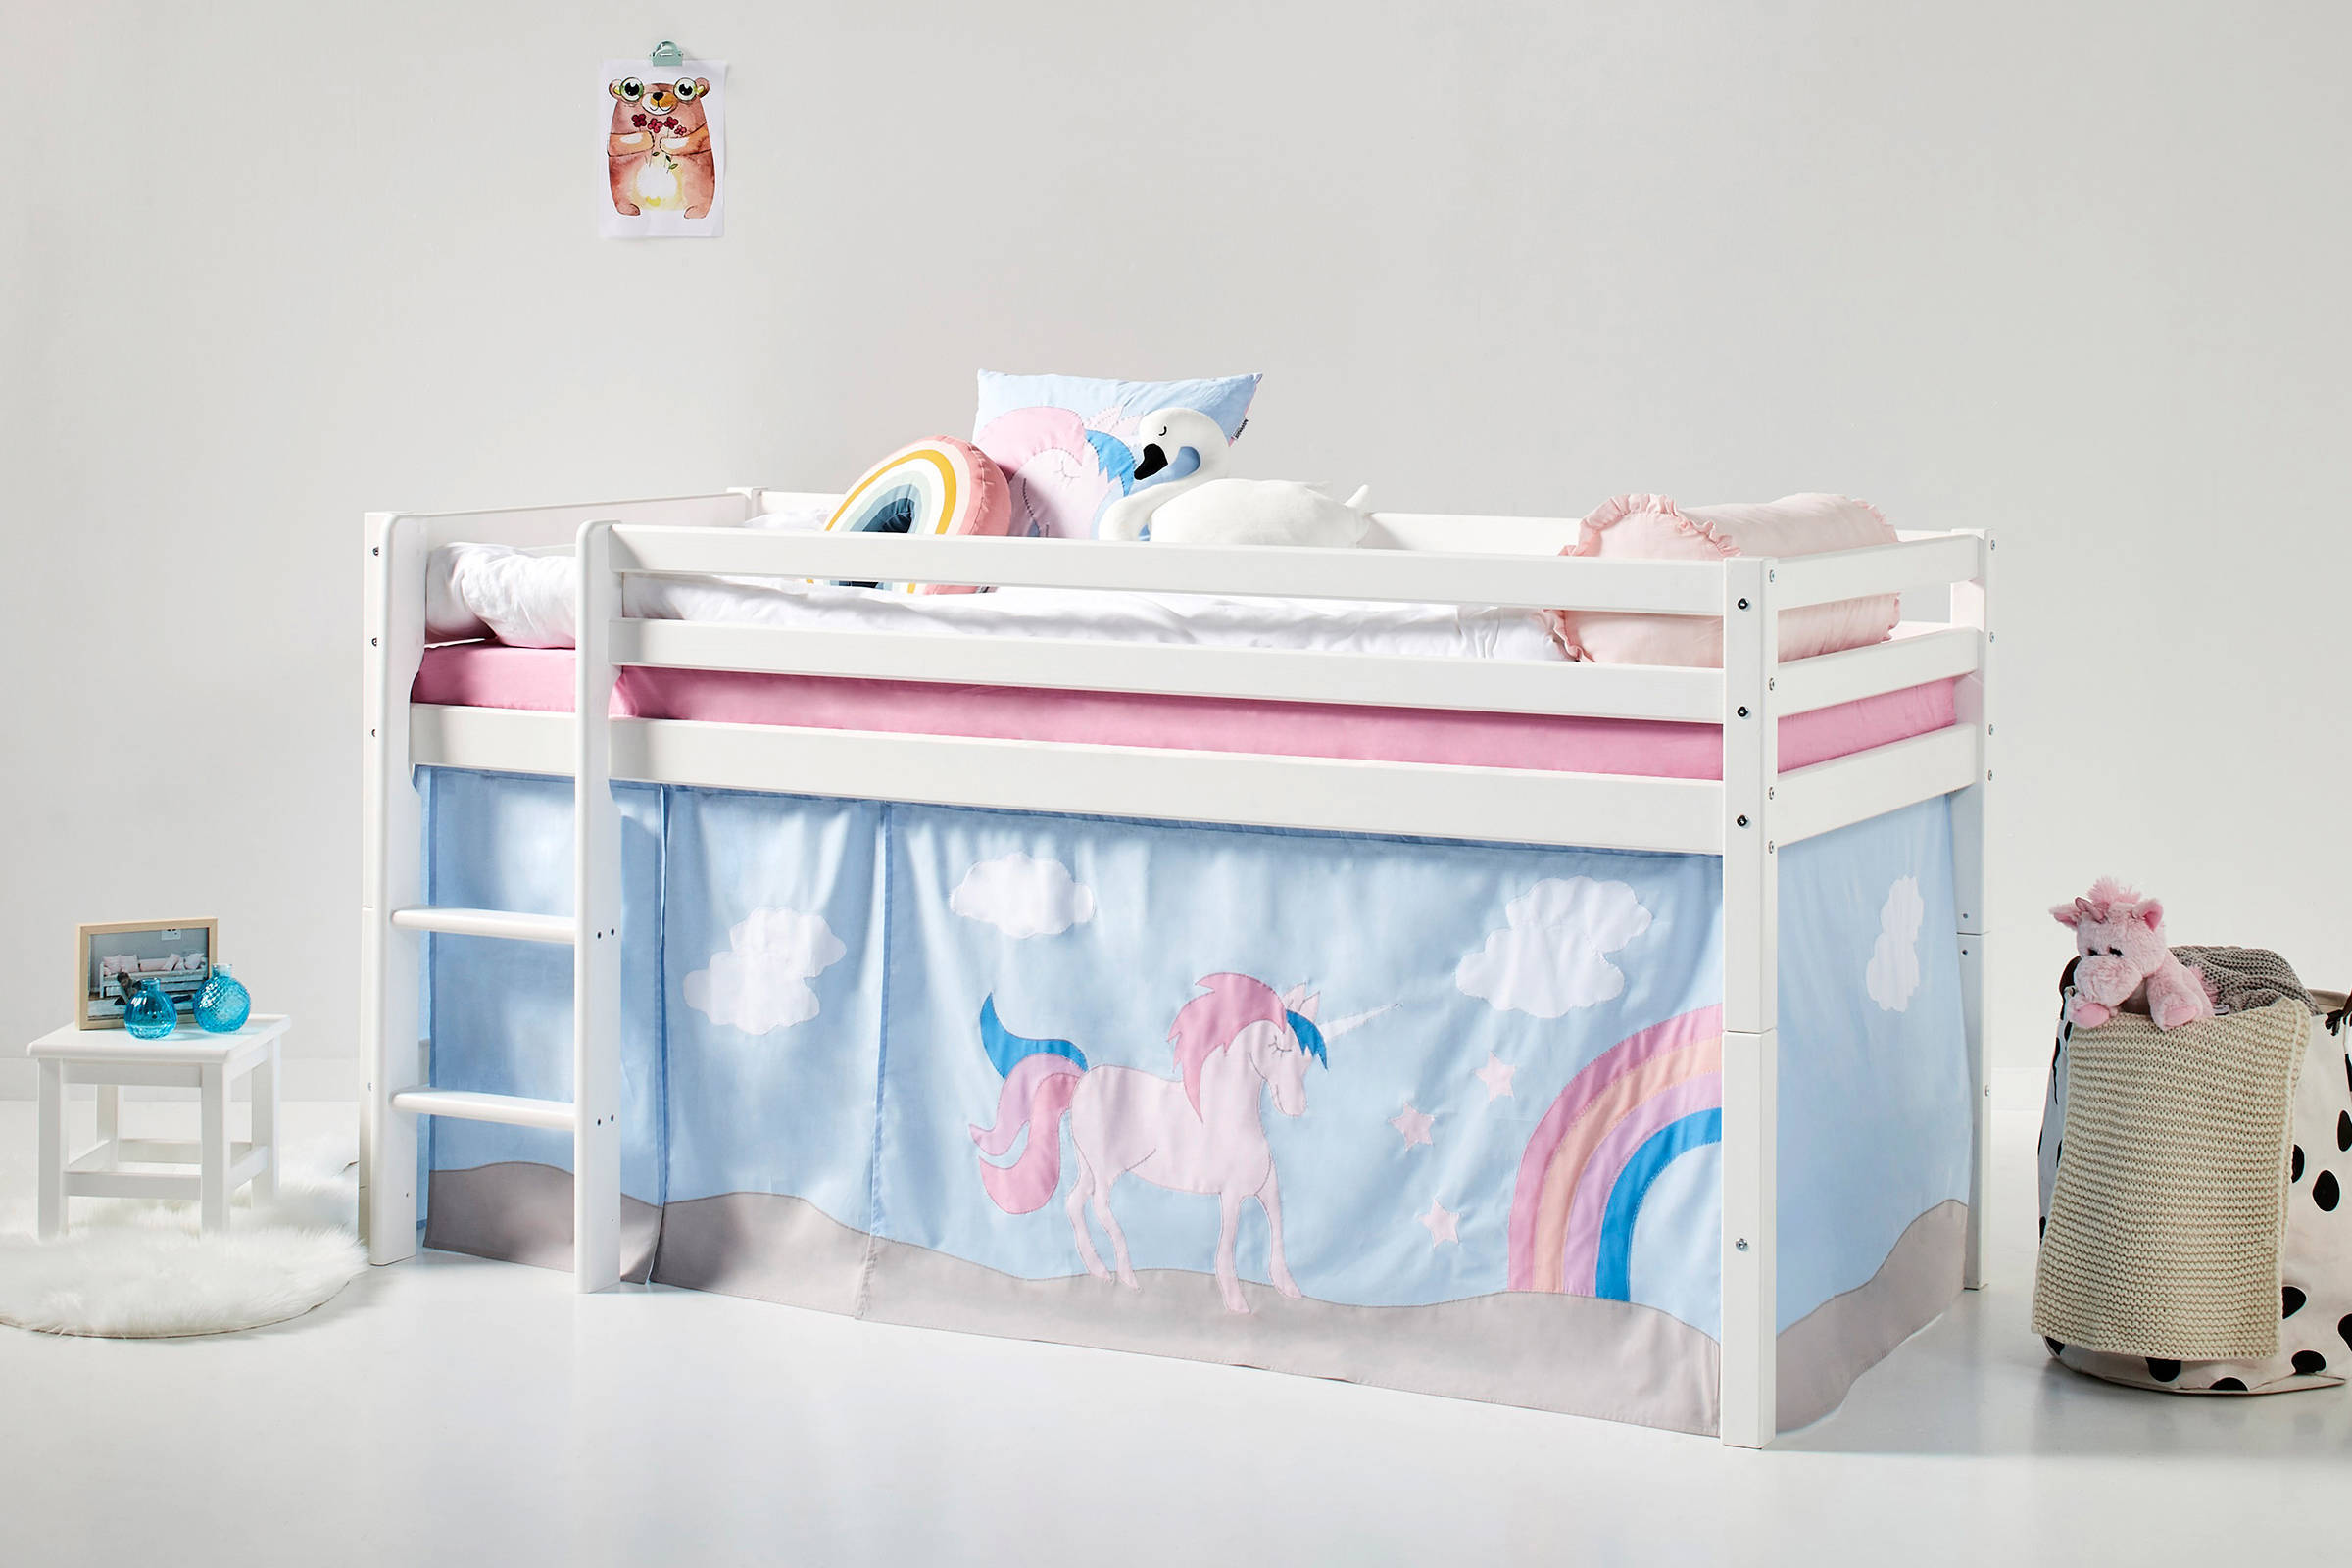 Bed Gordijn 10 : Pictures top design days dubai insight products design